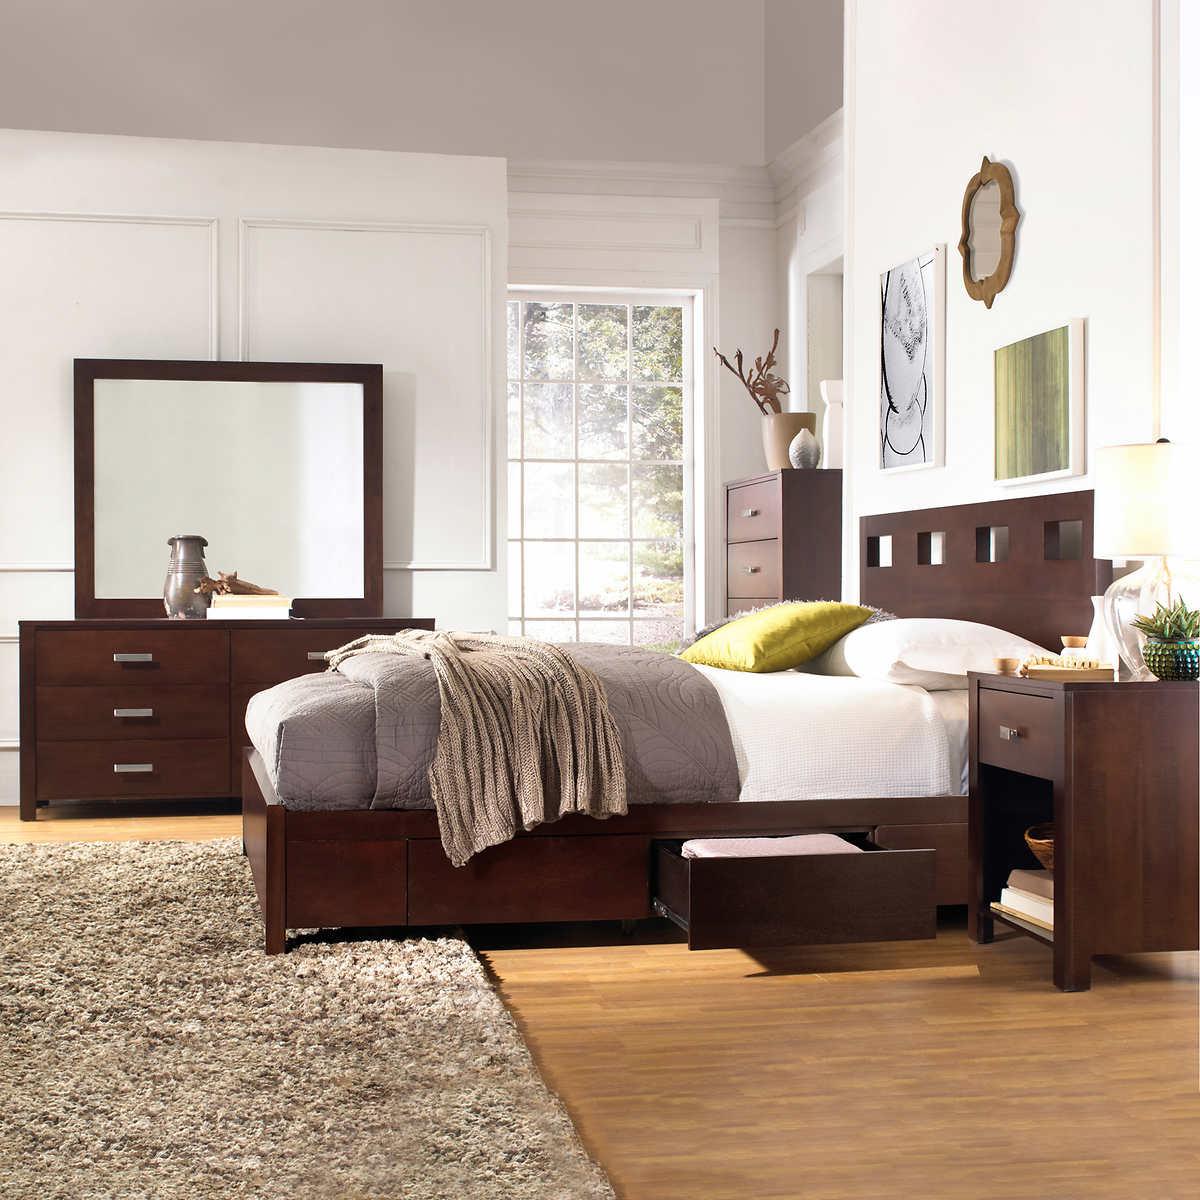 Paxton 6-piece Queen Storage Bedroom Set